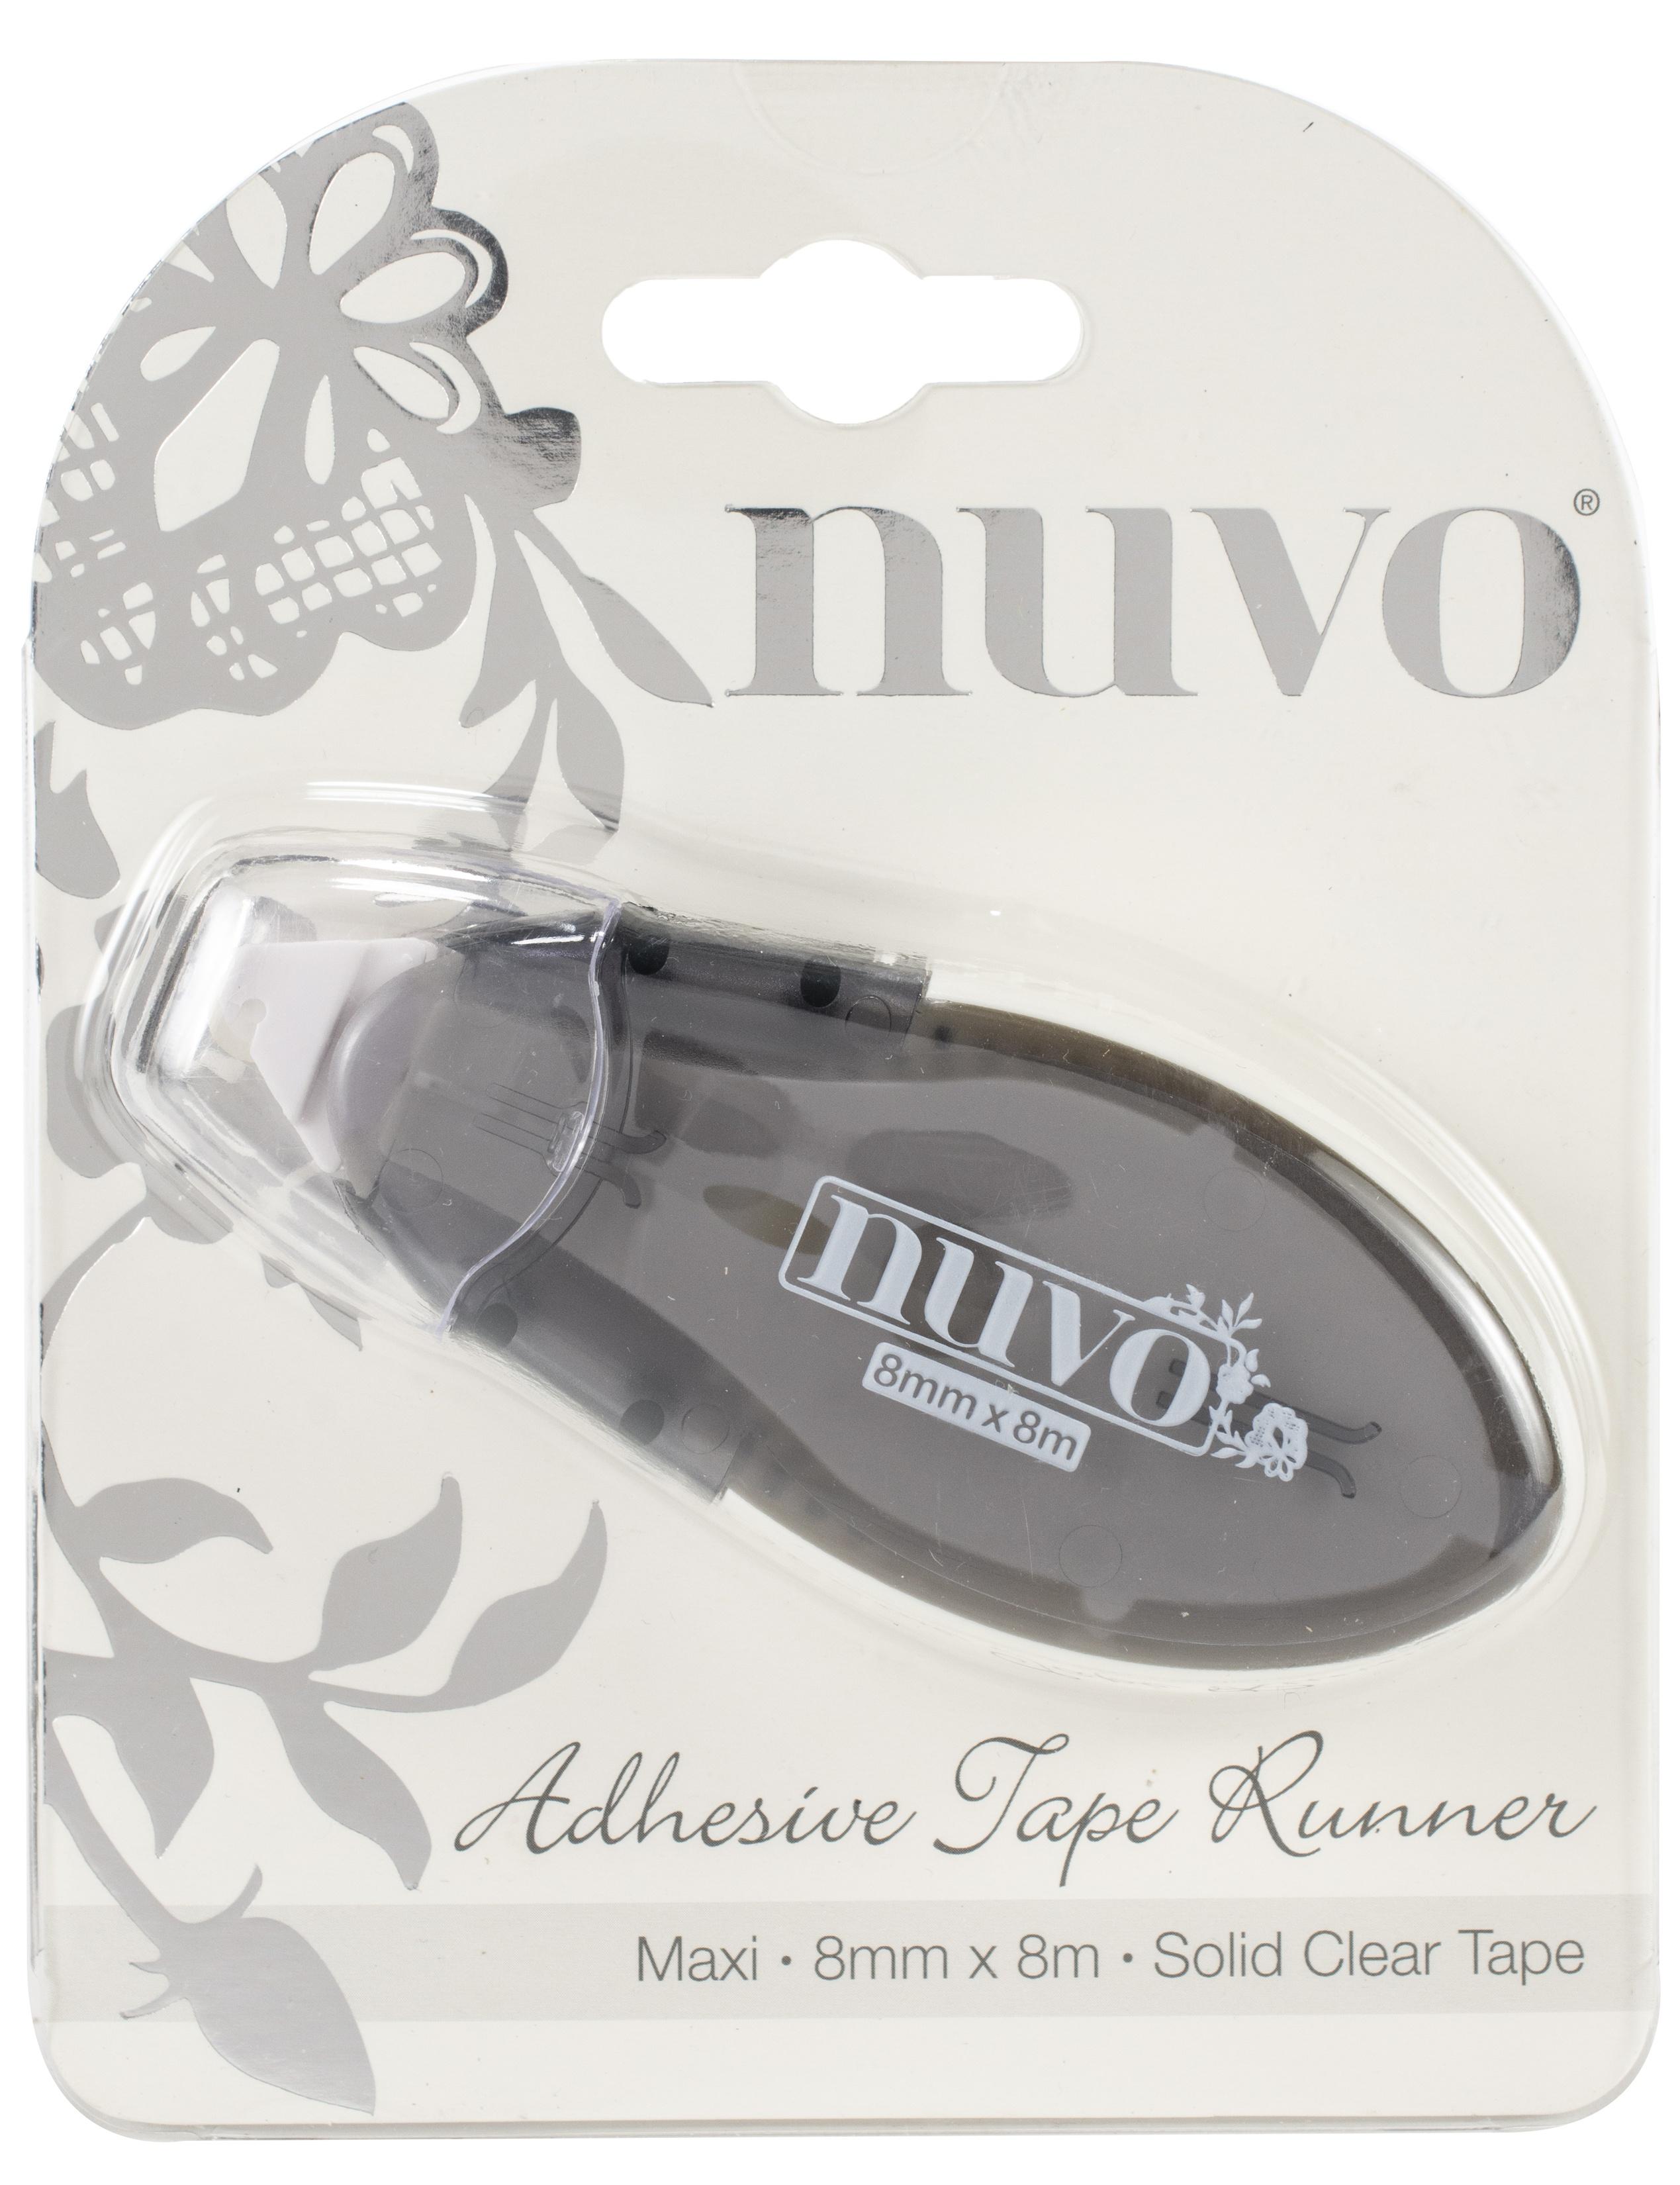 Nuvo Adhesive Tape Runner Maxi